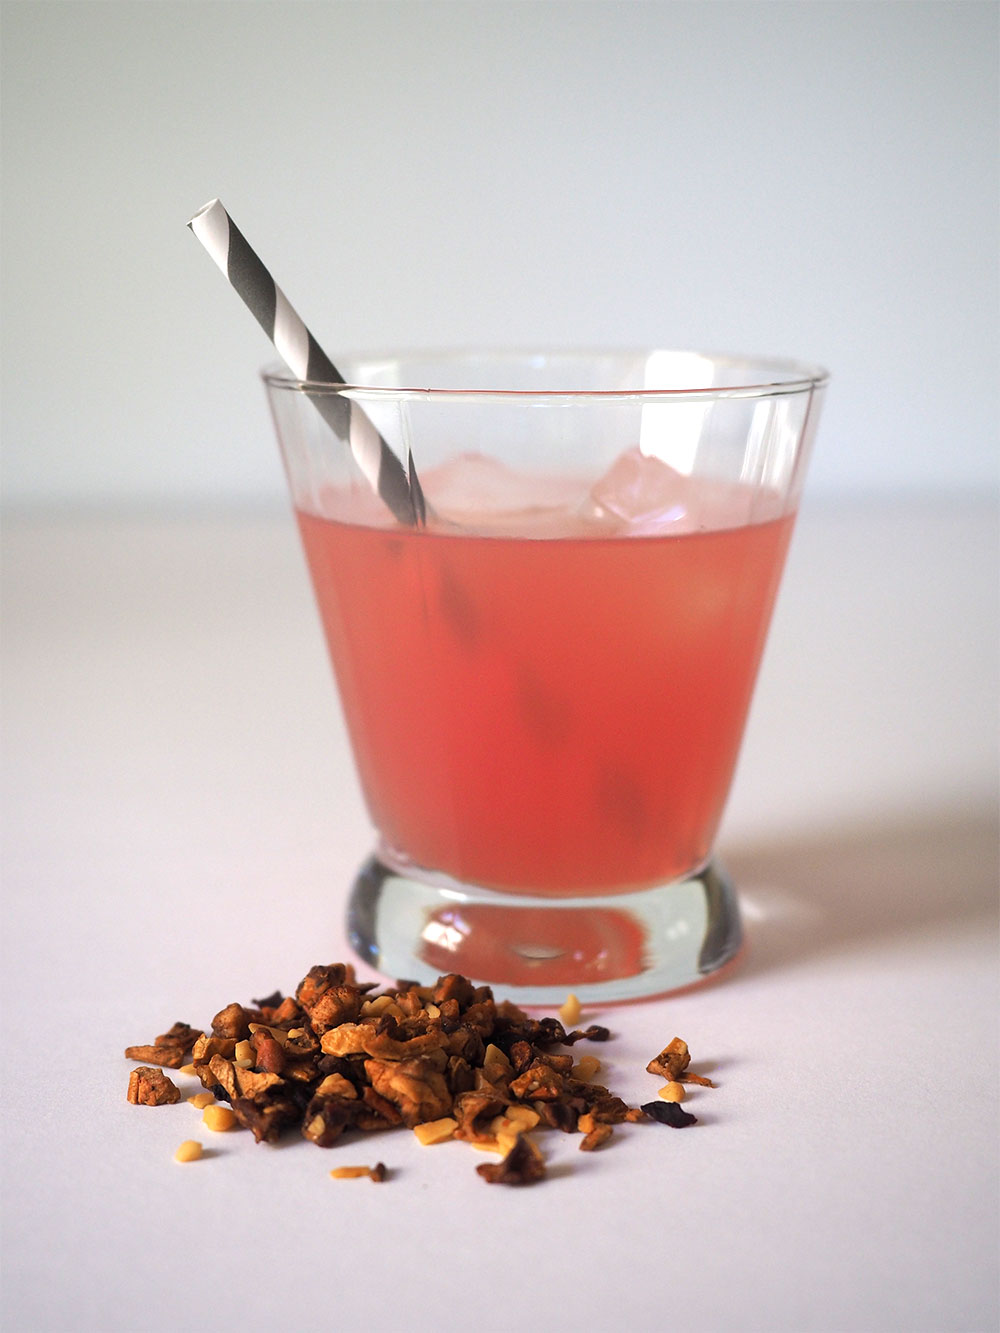 Roasted Almond Tea Review, Teahaus - Beginning with Bergamot